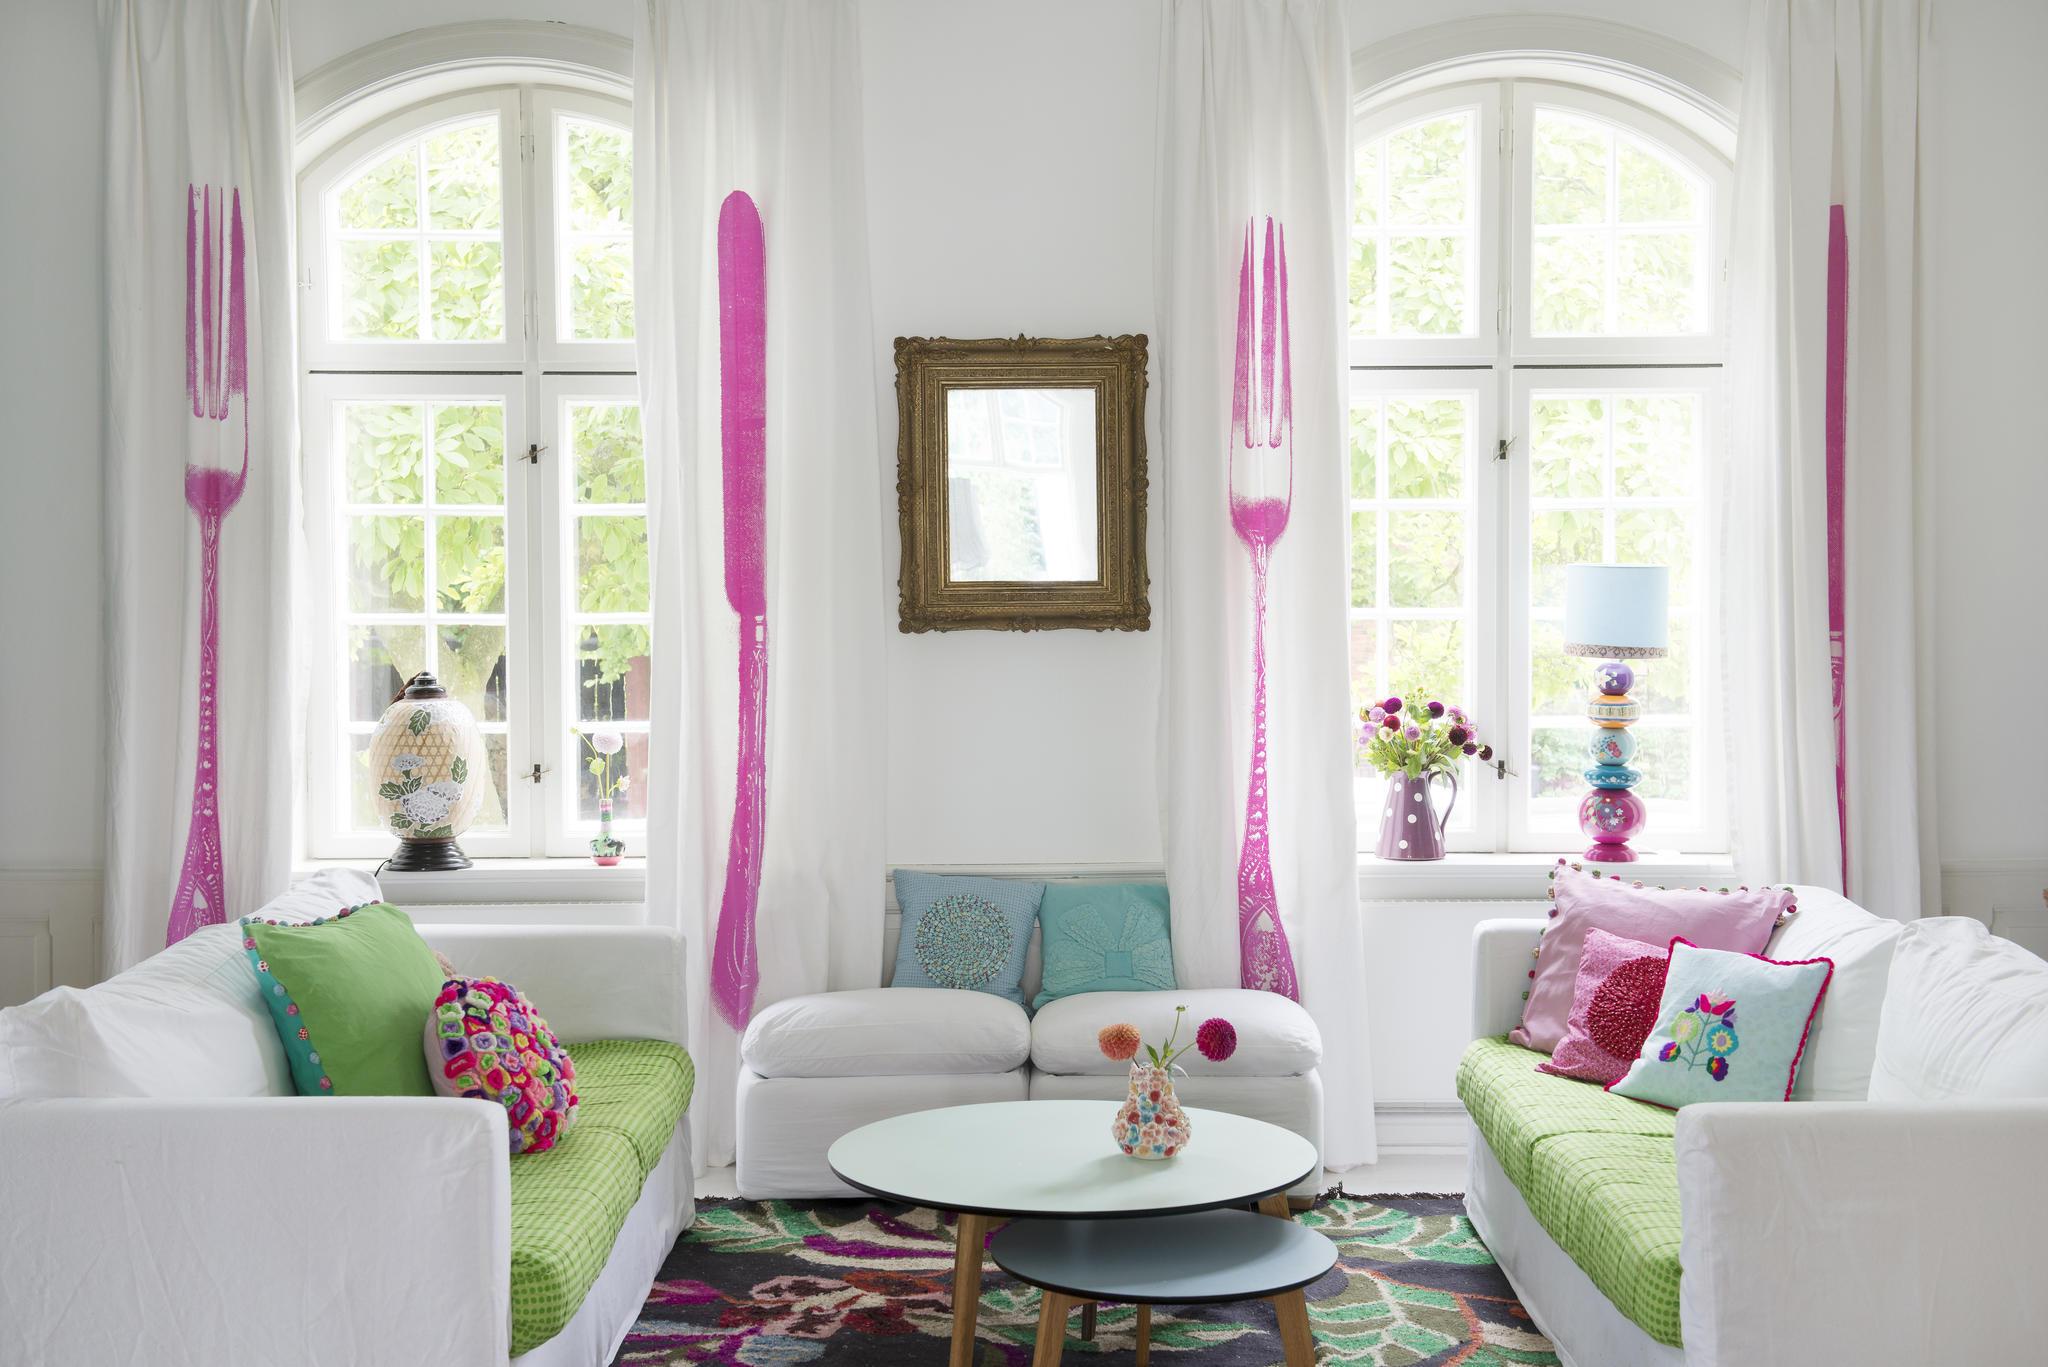 vardagsrum gardiner rosa bestick kuddar